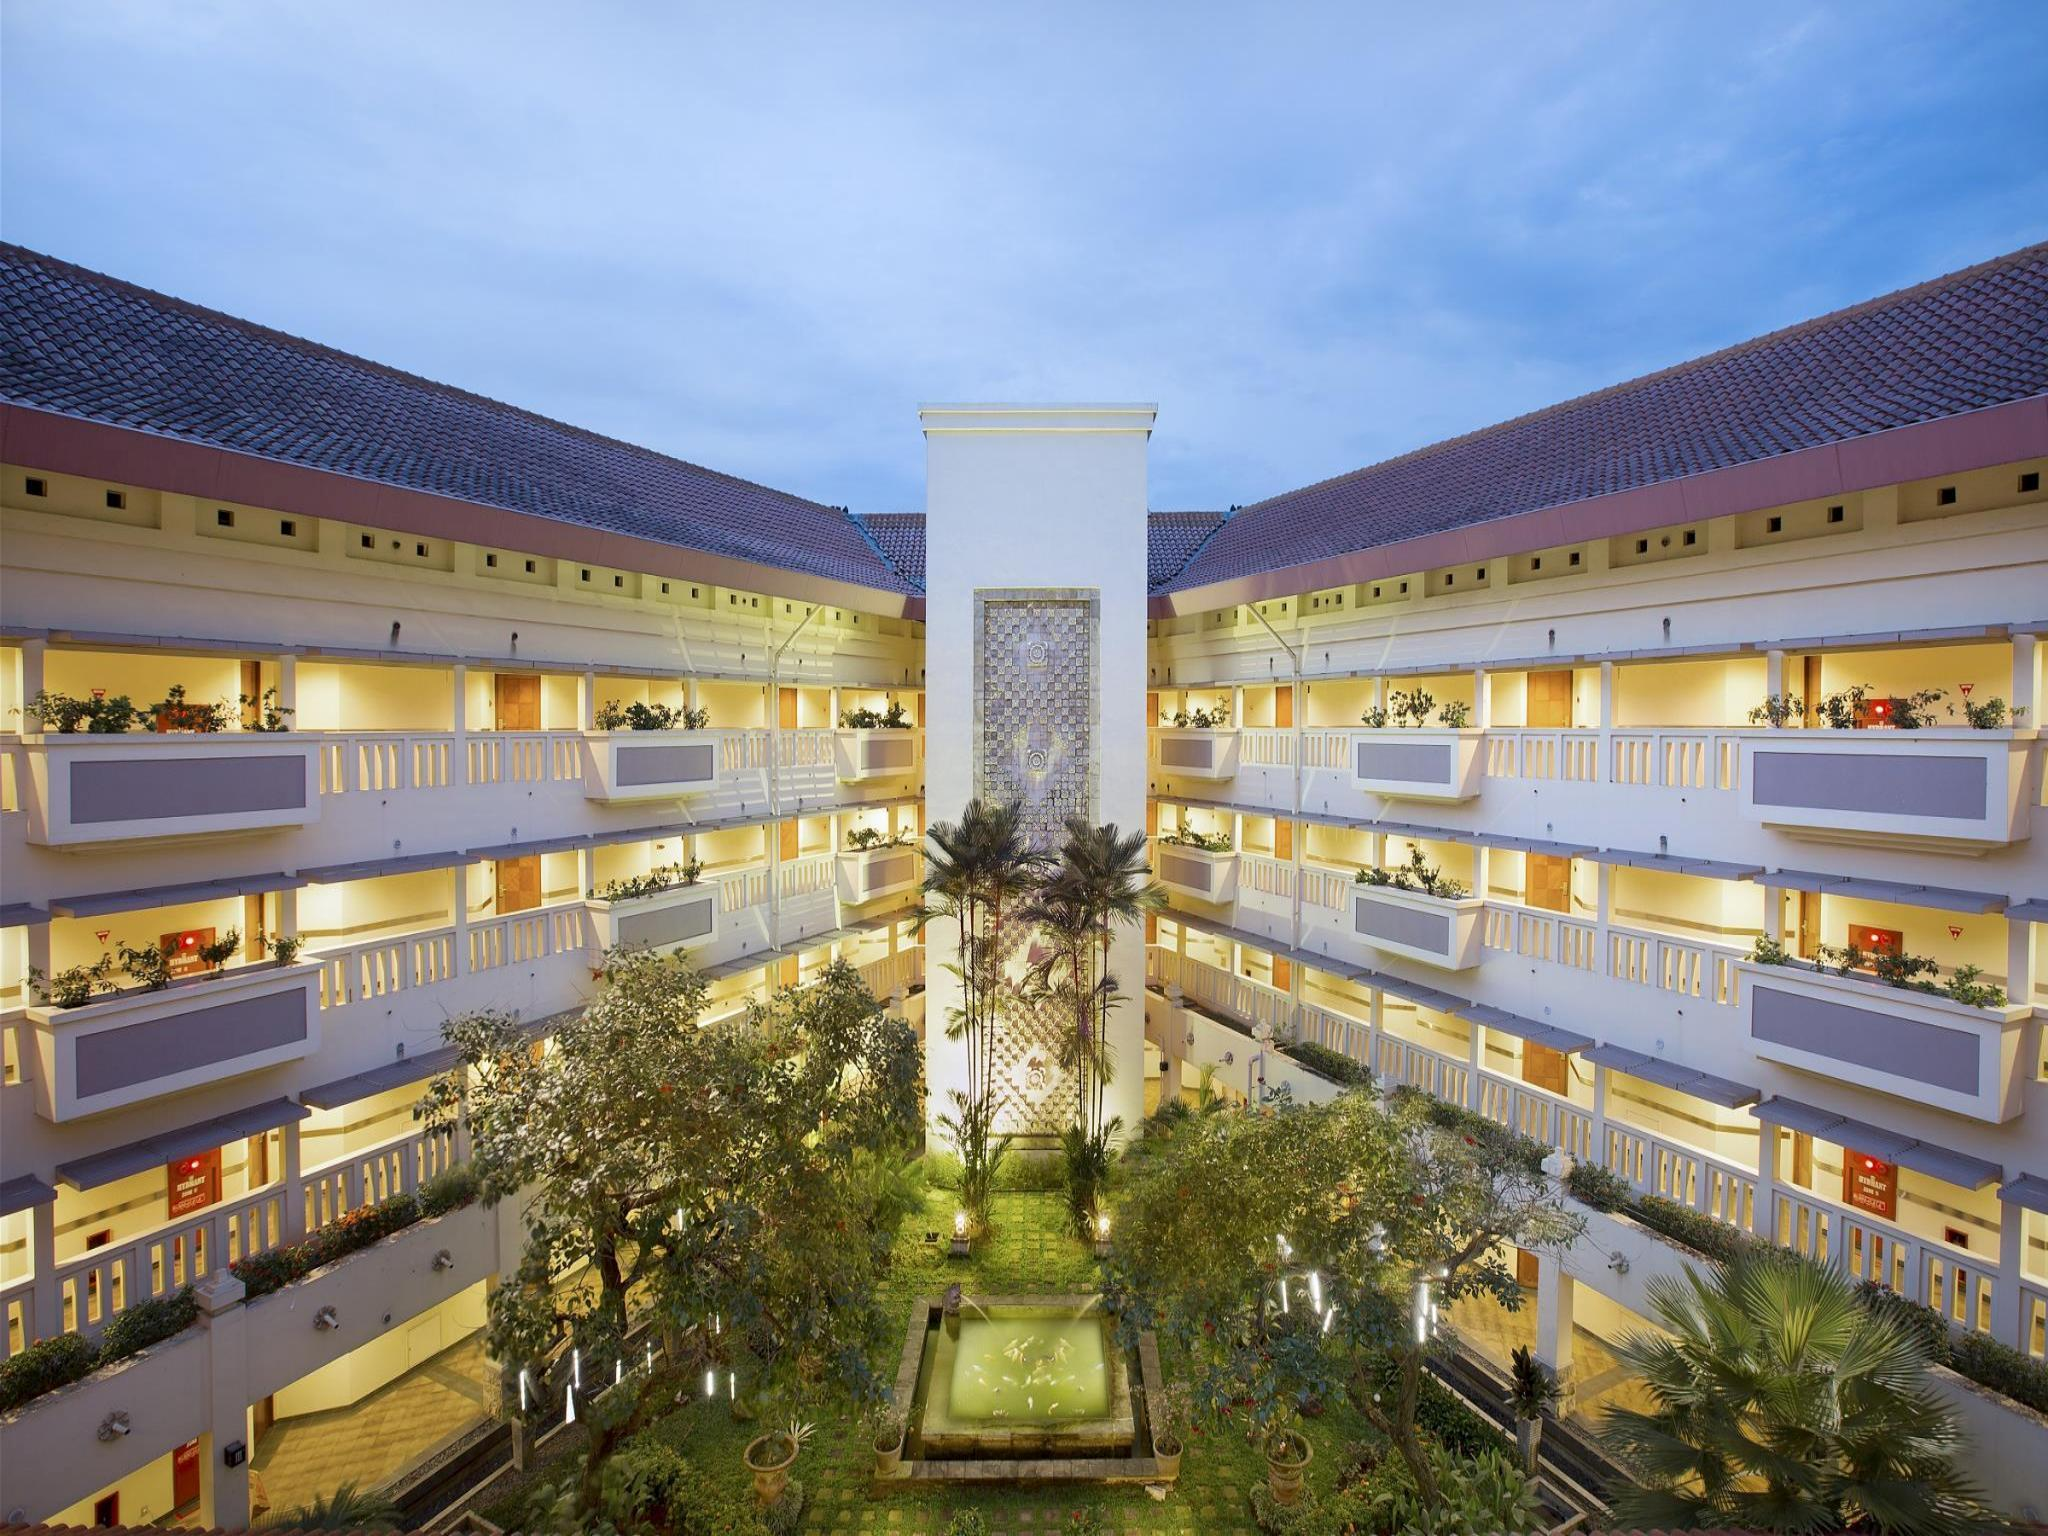 alamat hotel puri kiic golf view hotel karawang huiseenet id rh huisee net